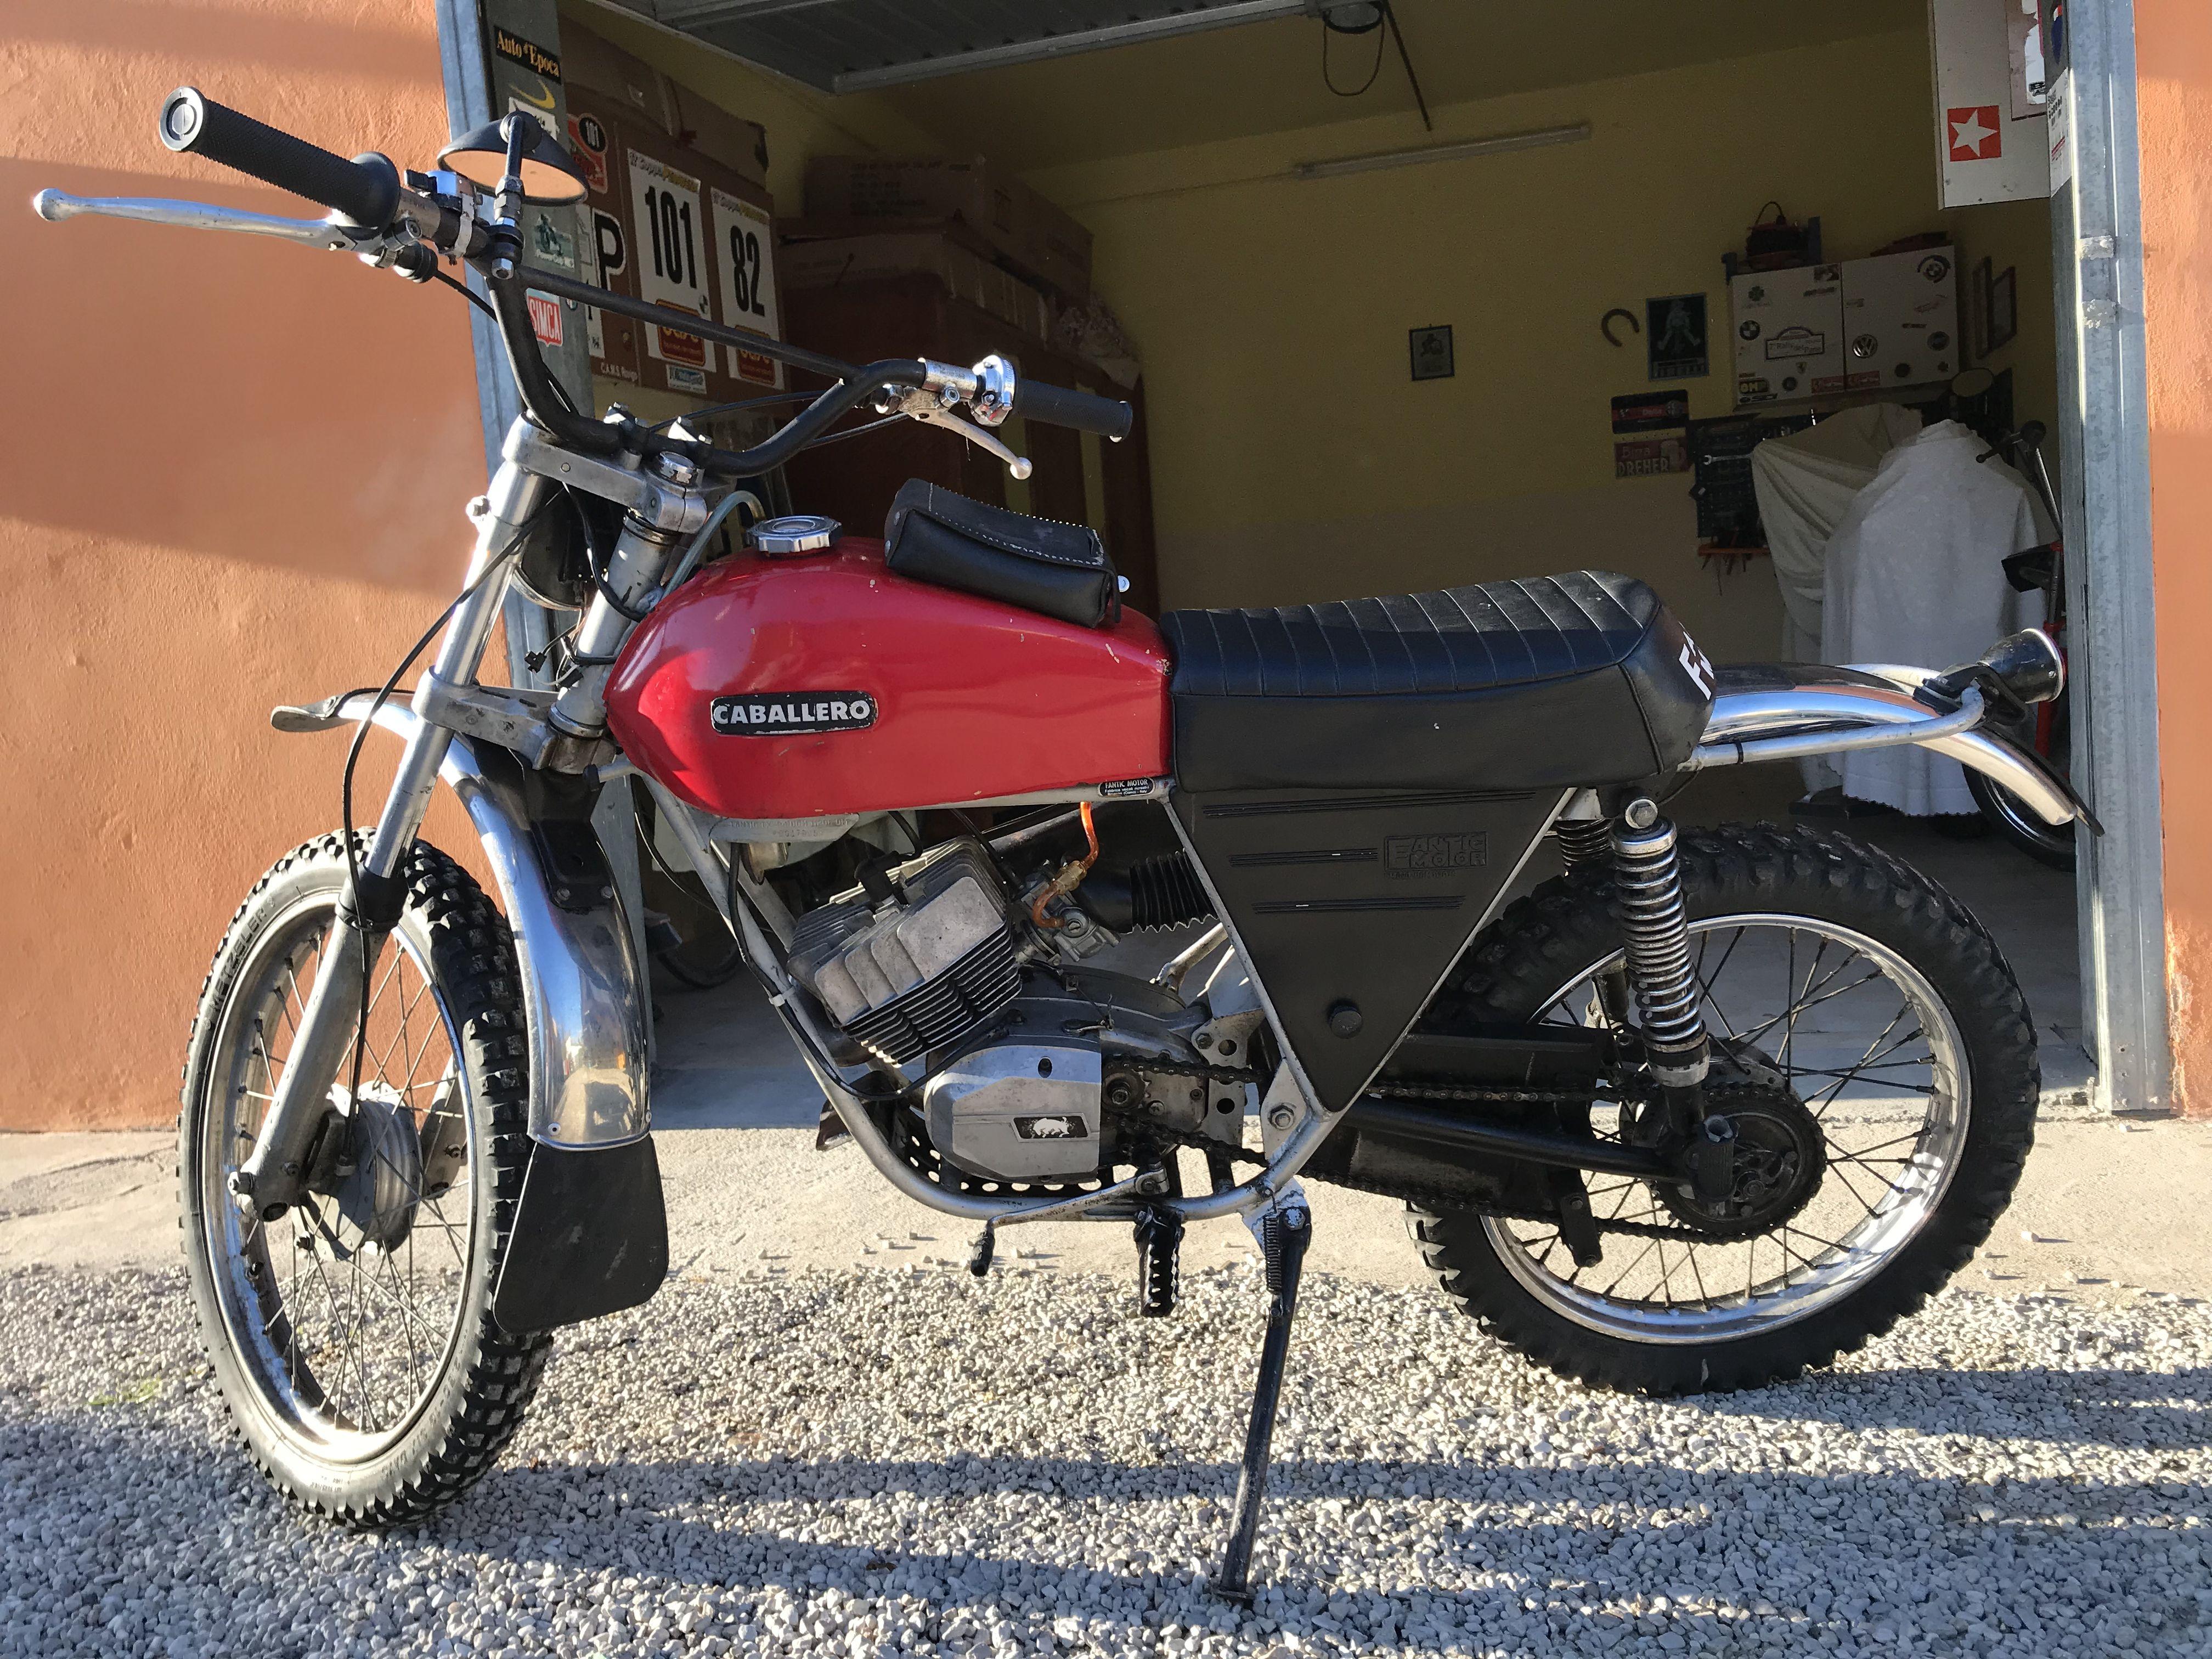 Fantic motor caballero 50 | Moto | Motorcycle, Vehicles